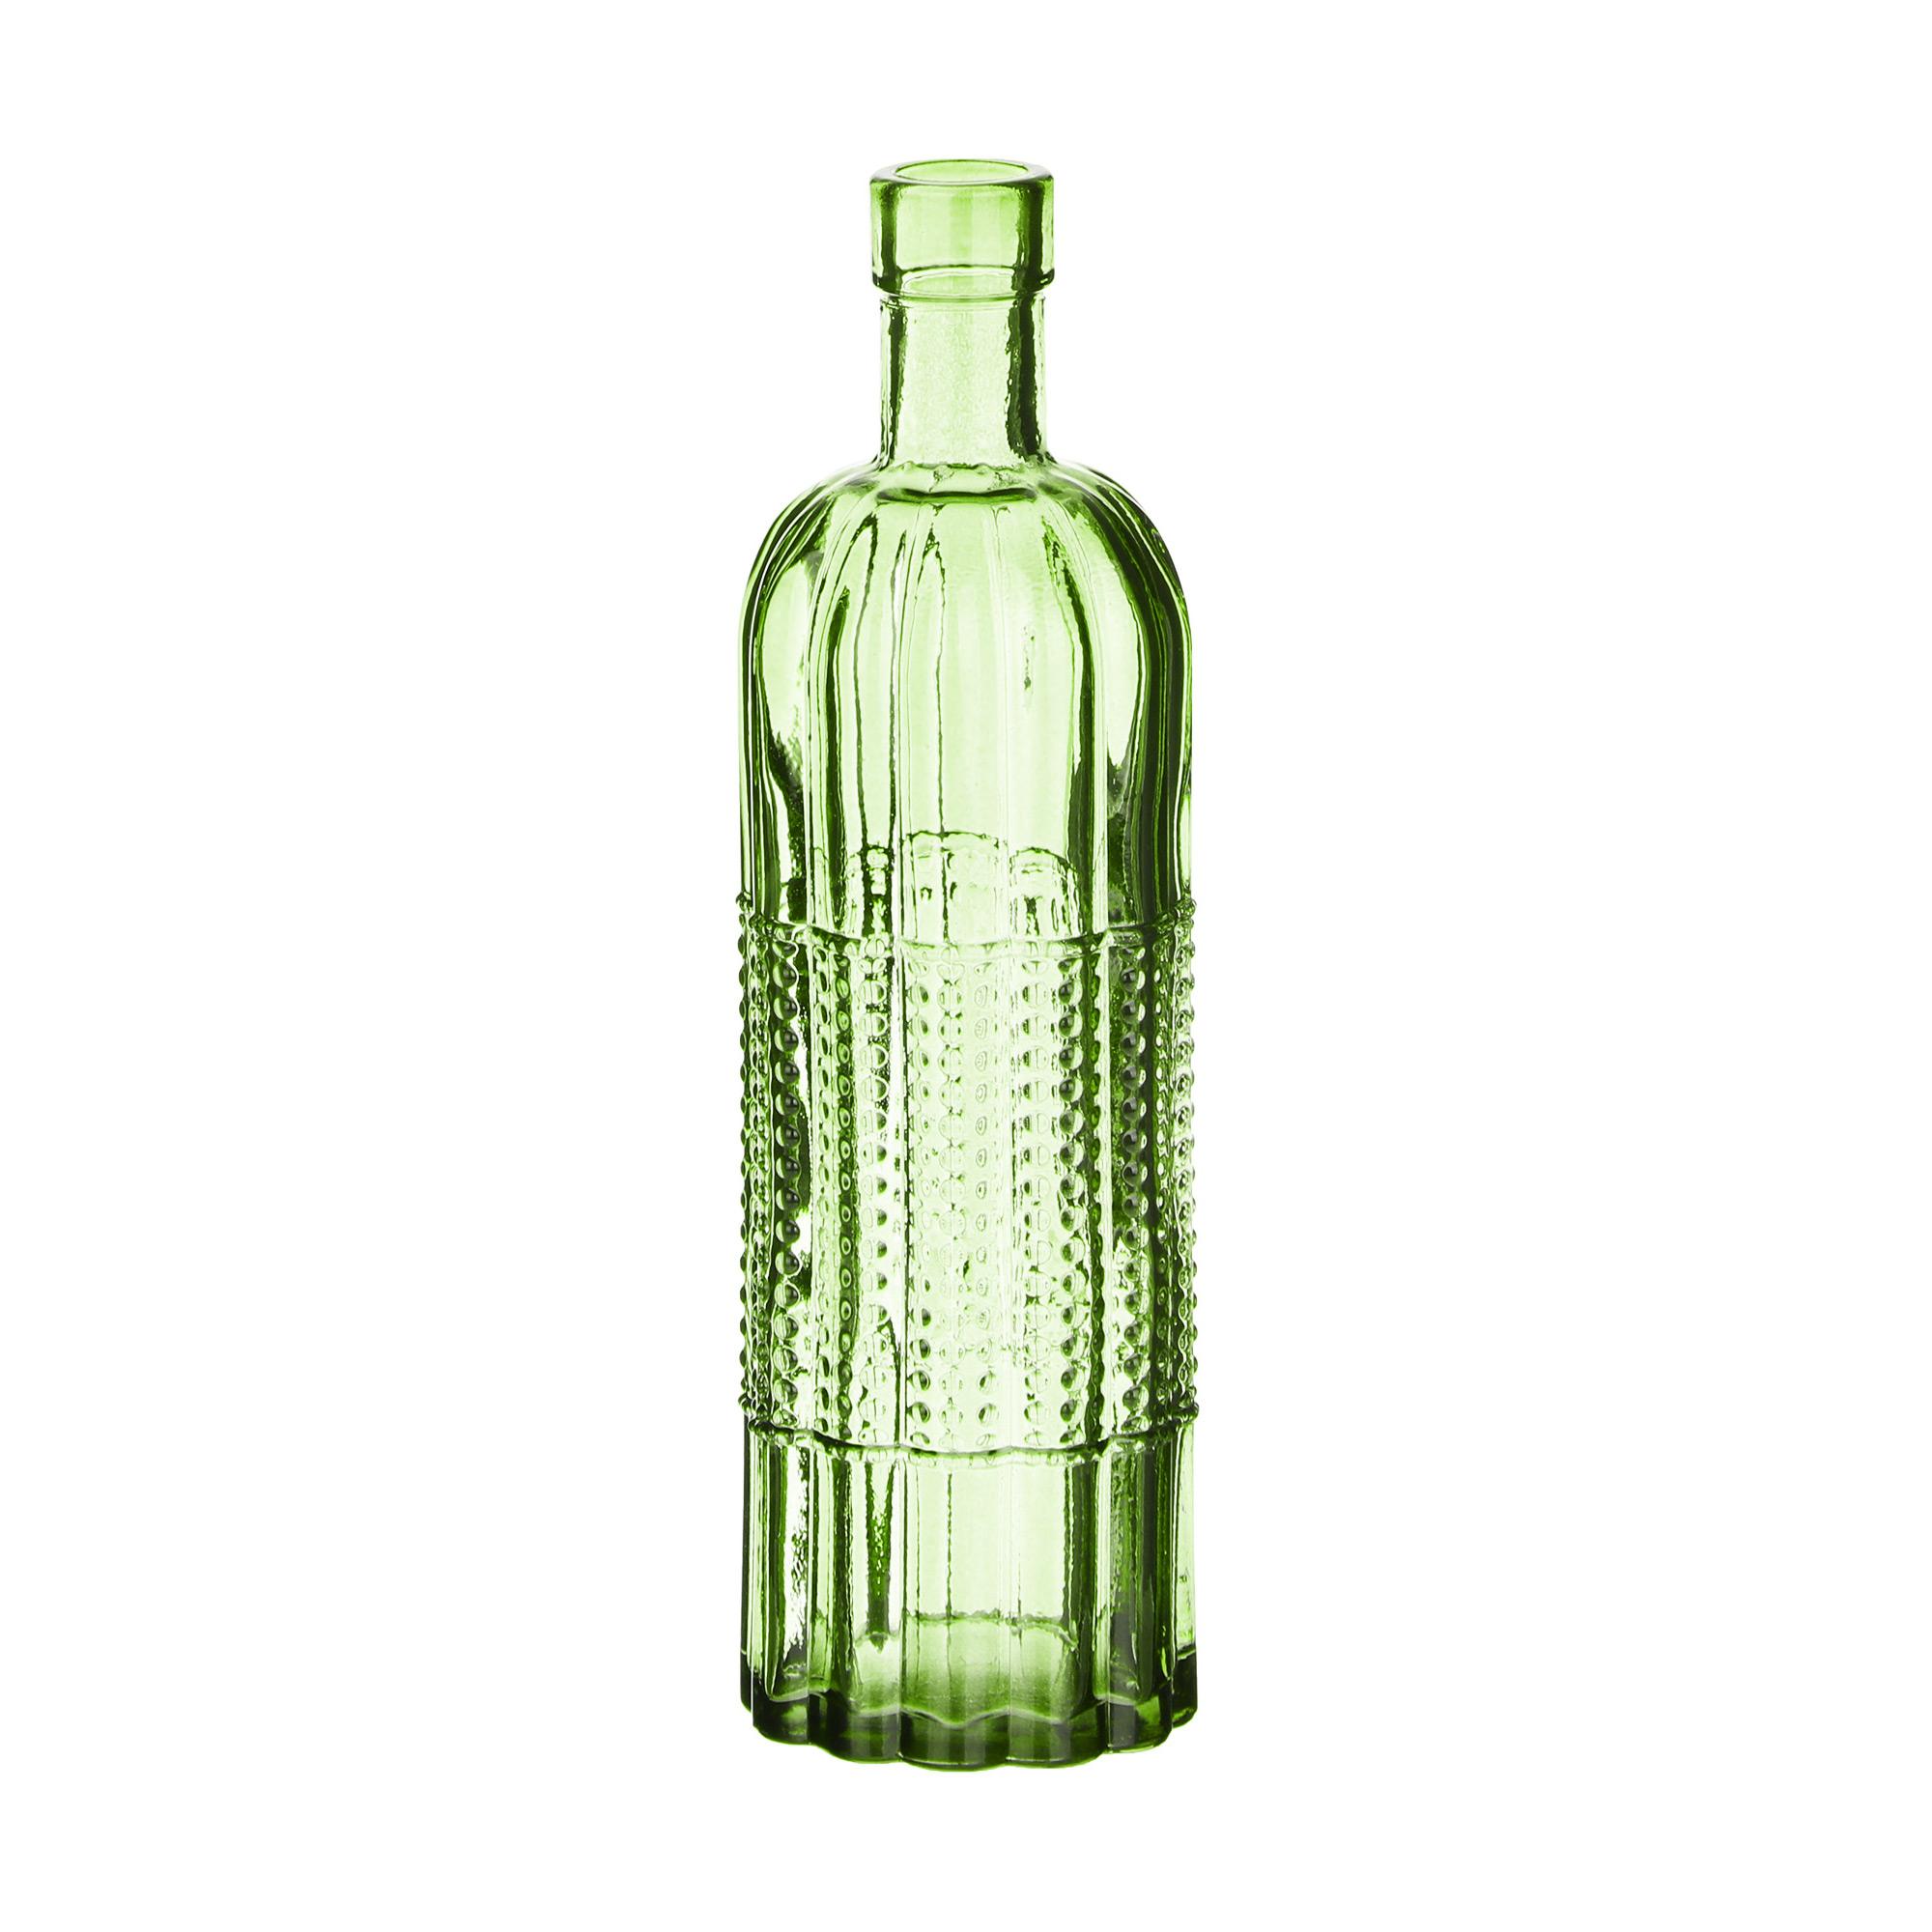 Бутылка-ваза стеклянная Kaemingk д7х24cm в ассортименте vz 549 ваза стеклянная жостово h 600 кувшин